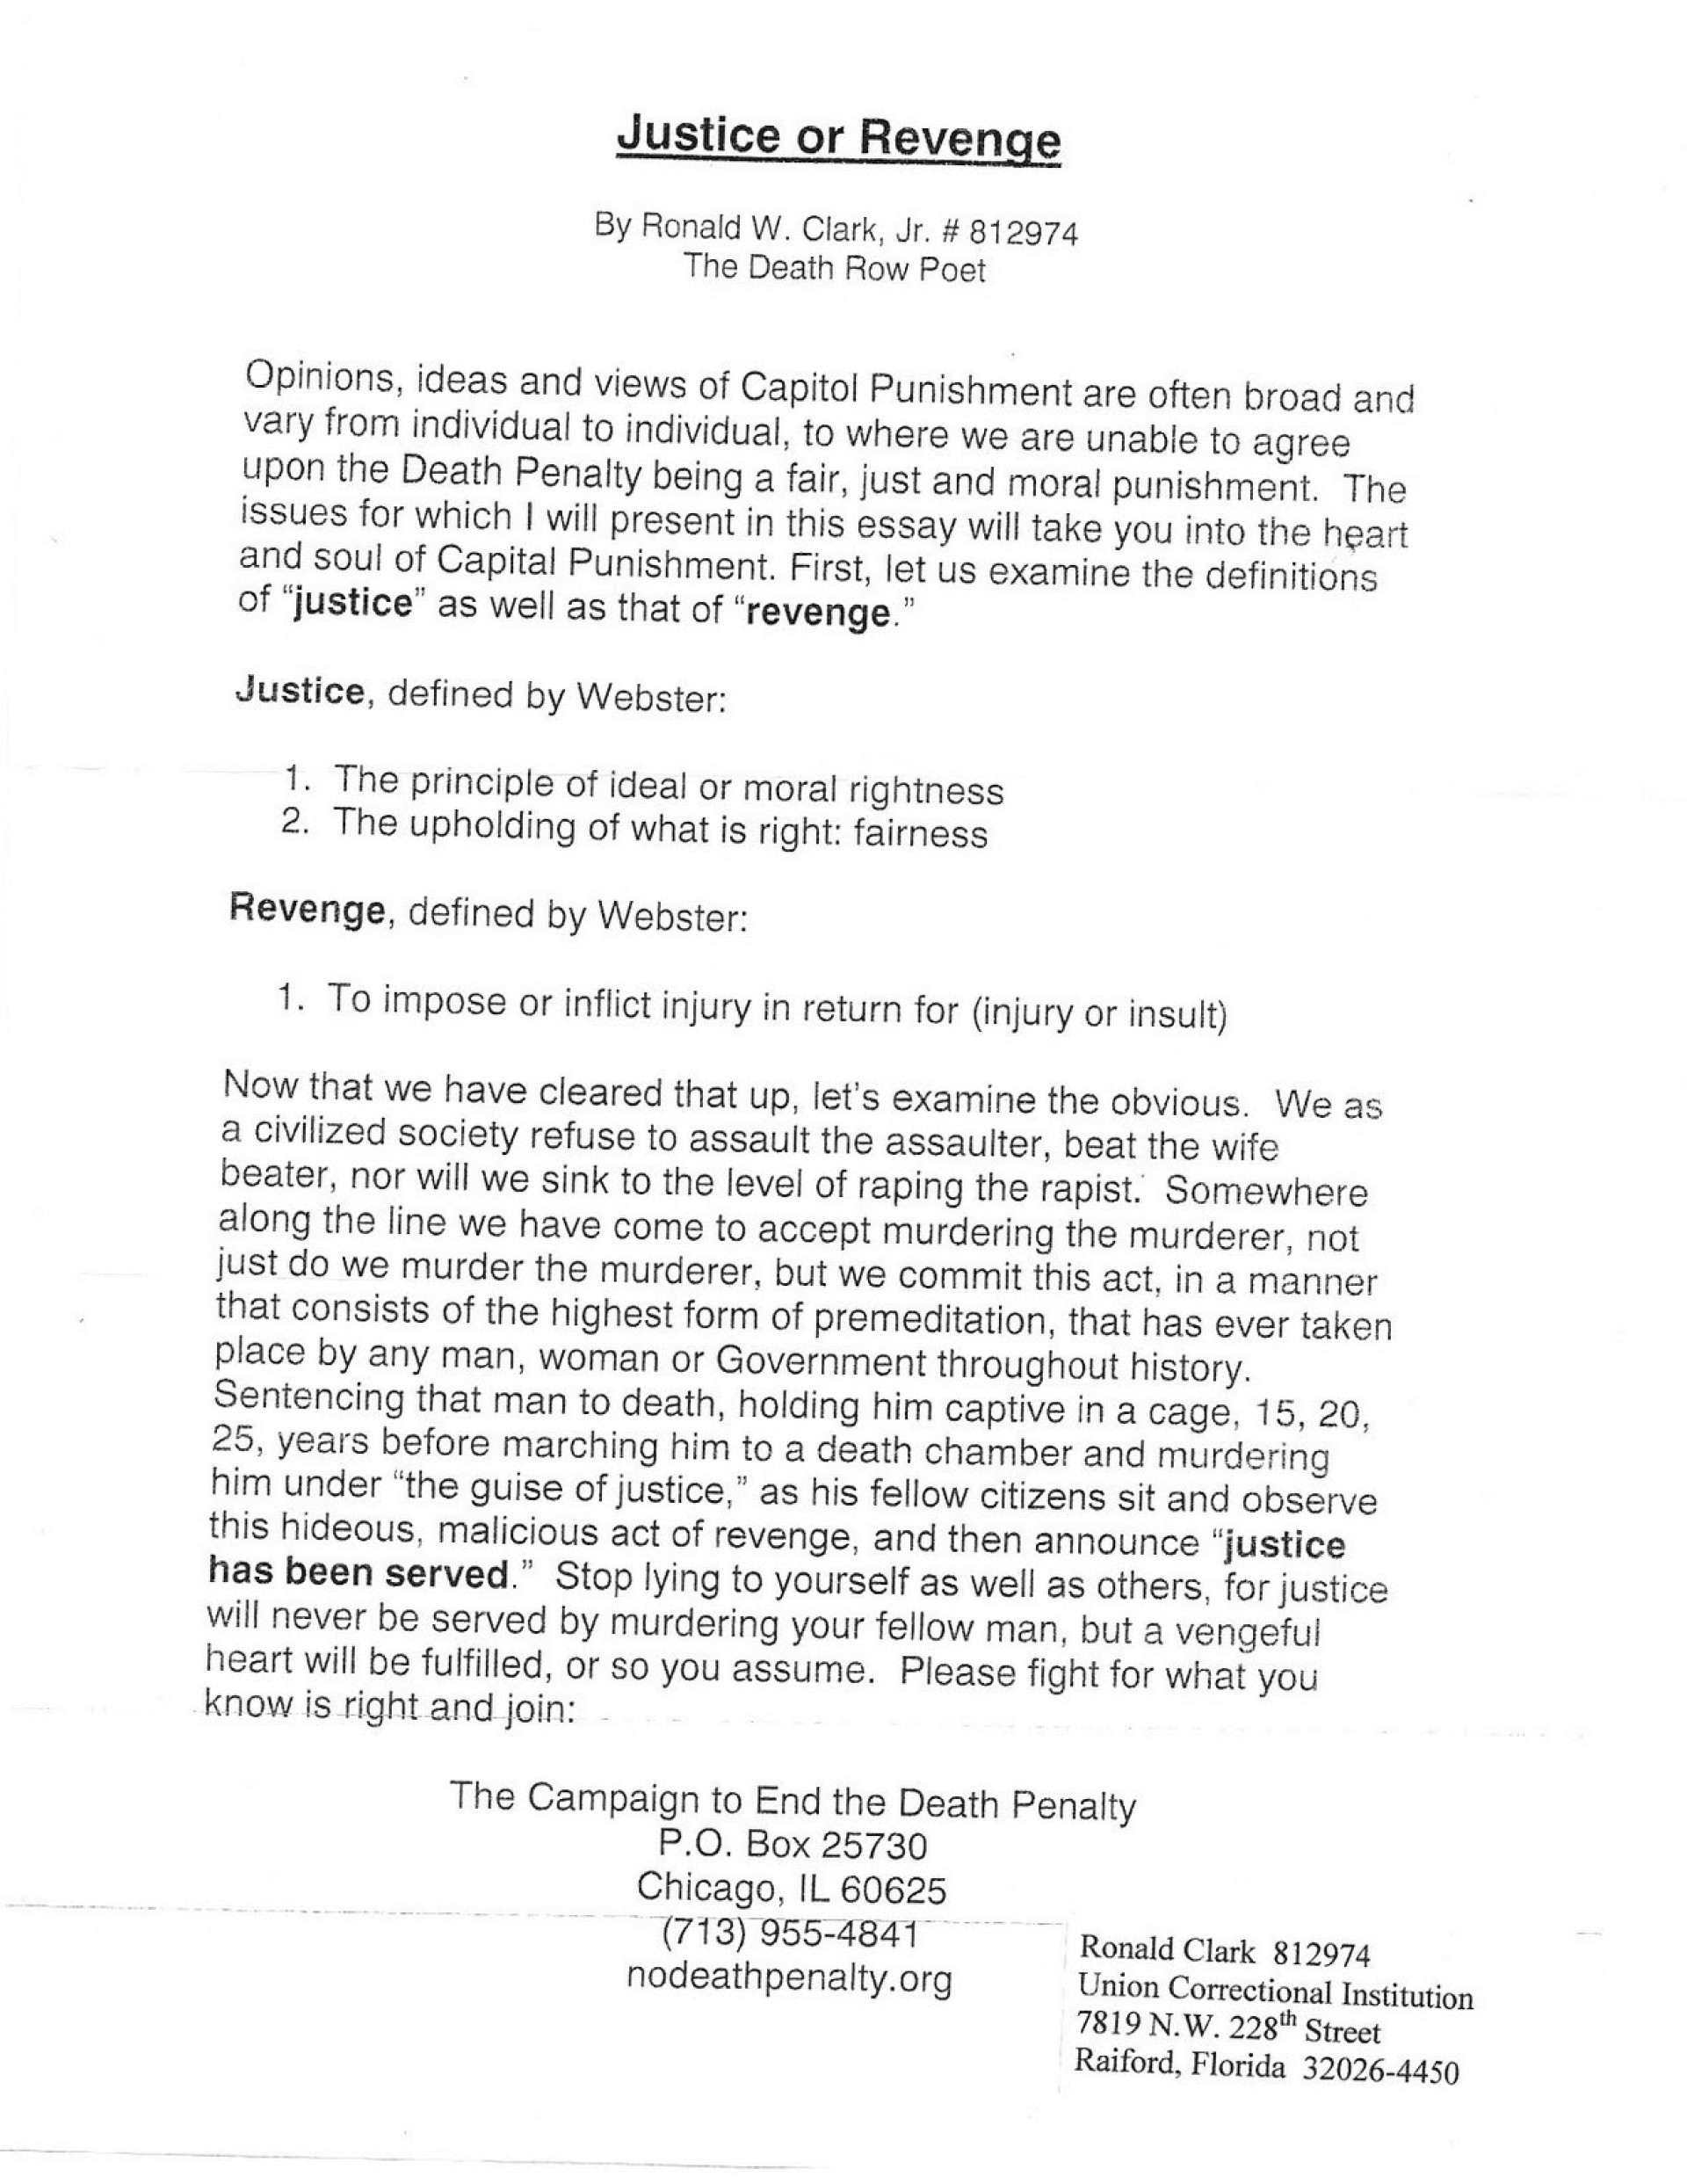 010 Death Penalty Essays Essay Example Scn 0008 Sensational Anti Conclusion Hook For Pro Argumentative 1920